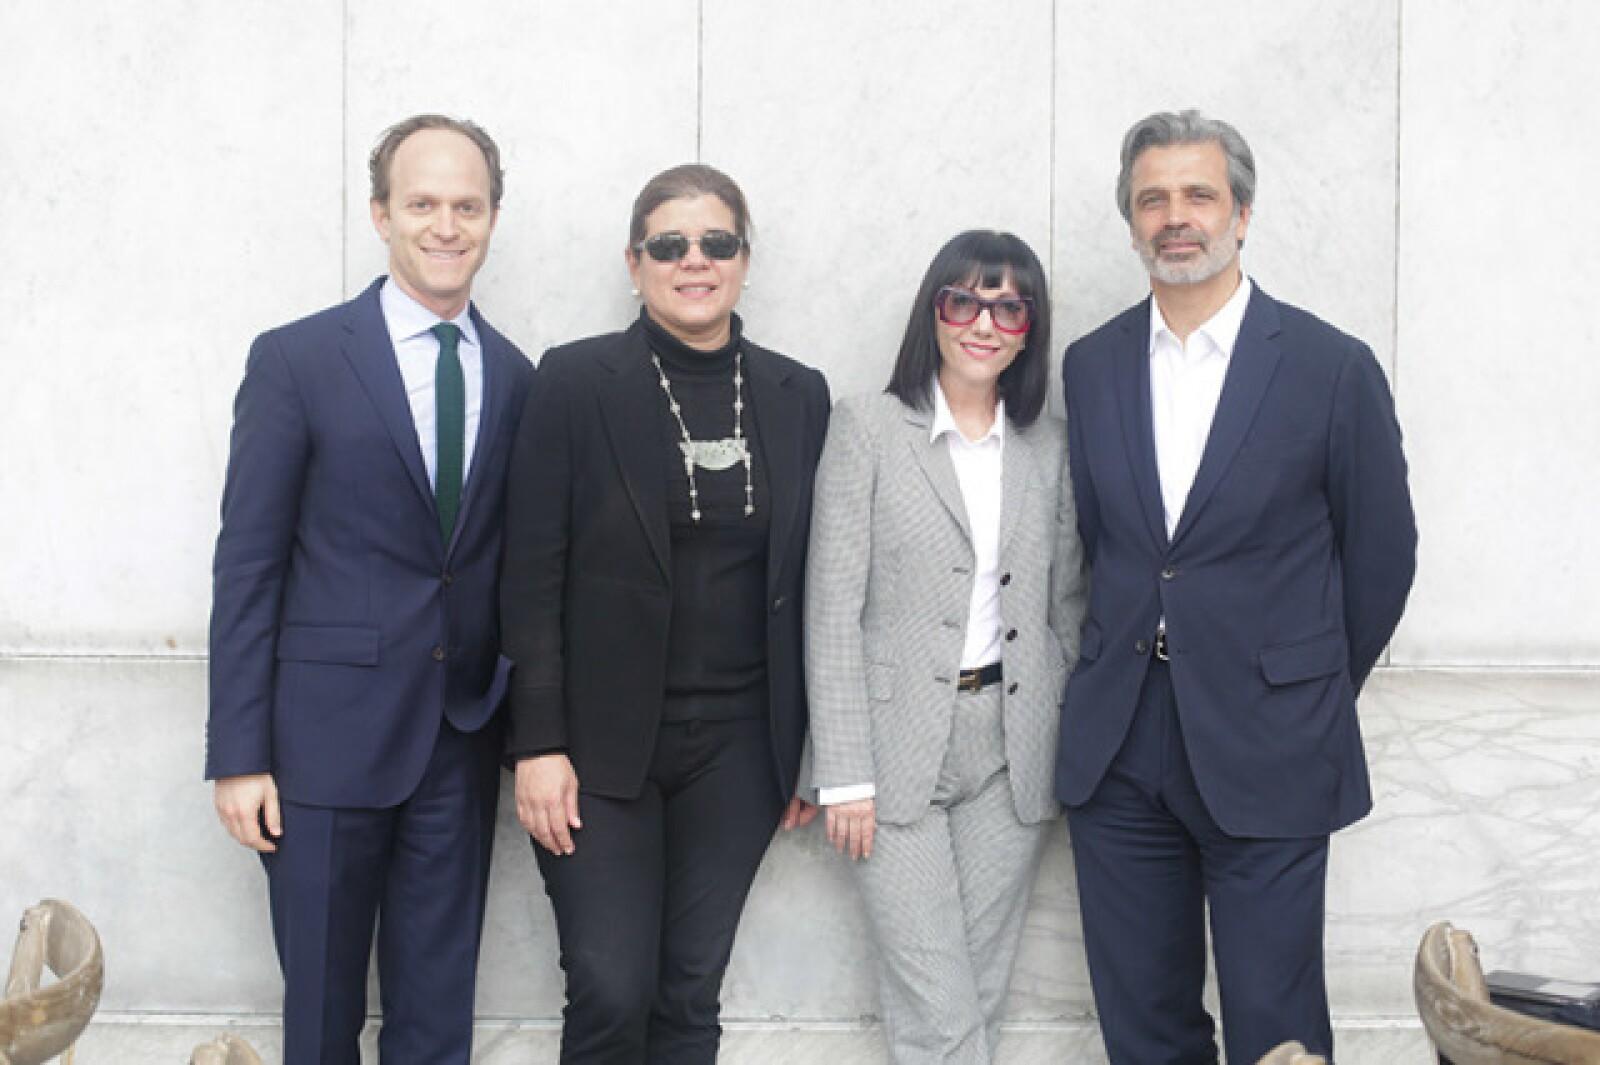 Ari Wiseman, Sonya Santos, Ana Cristina Cabezut y Miguel Fernández Félix